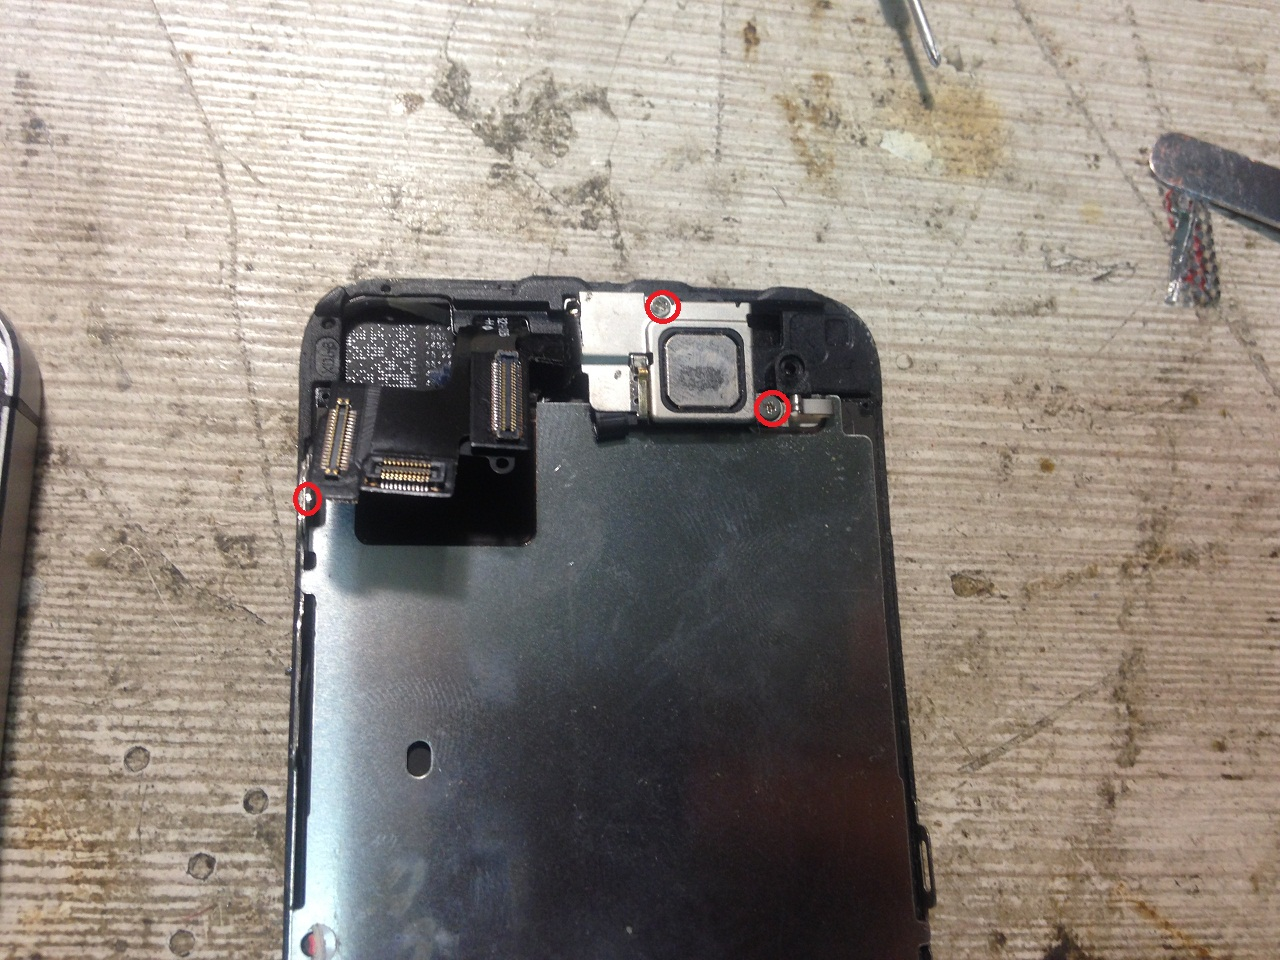 Замена дисплея iphone 5s своими руками фото 373